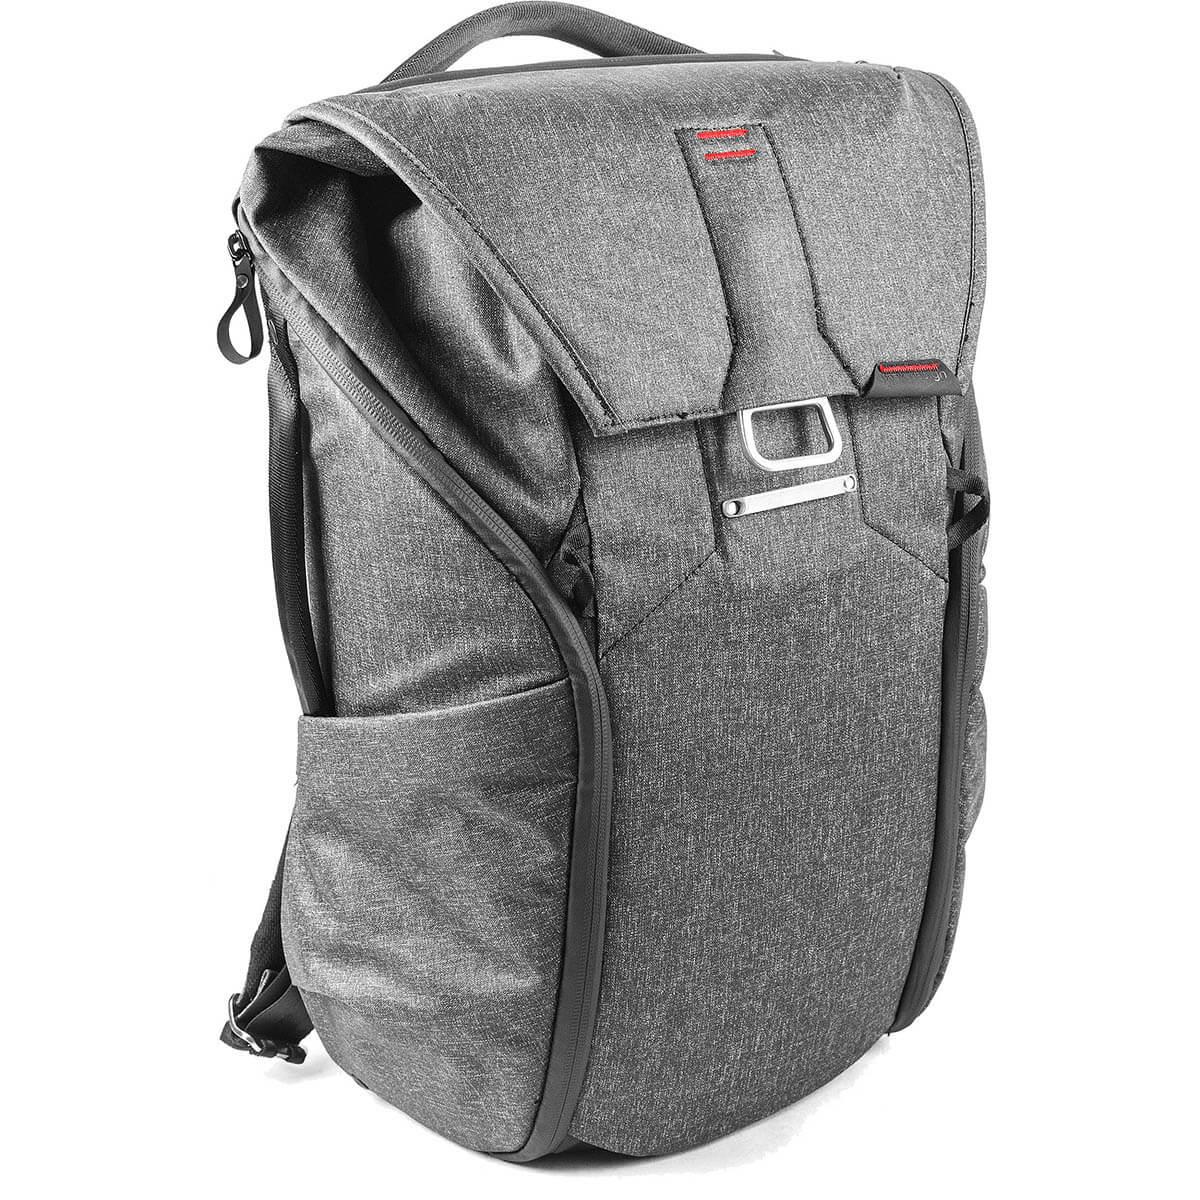 Best Camera Backpacks for Travel - Peak Design Everyday Backpack